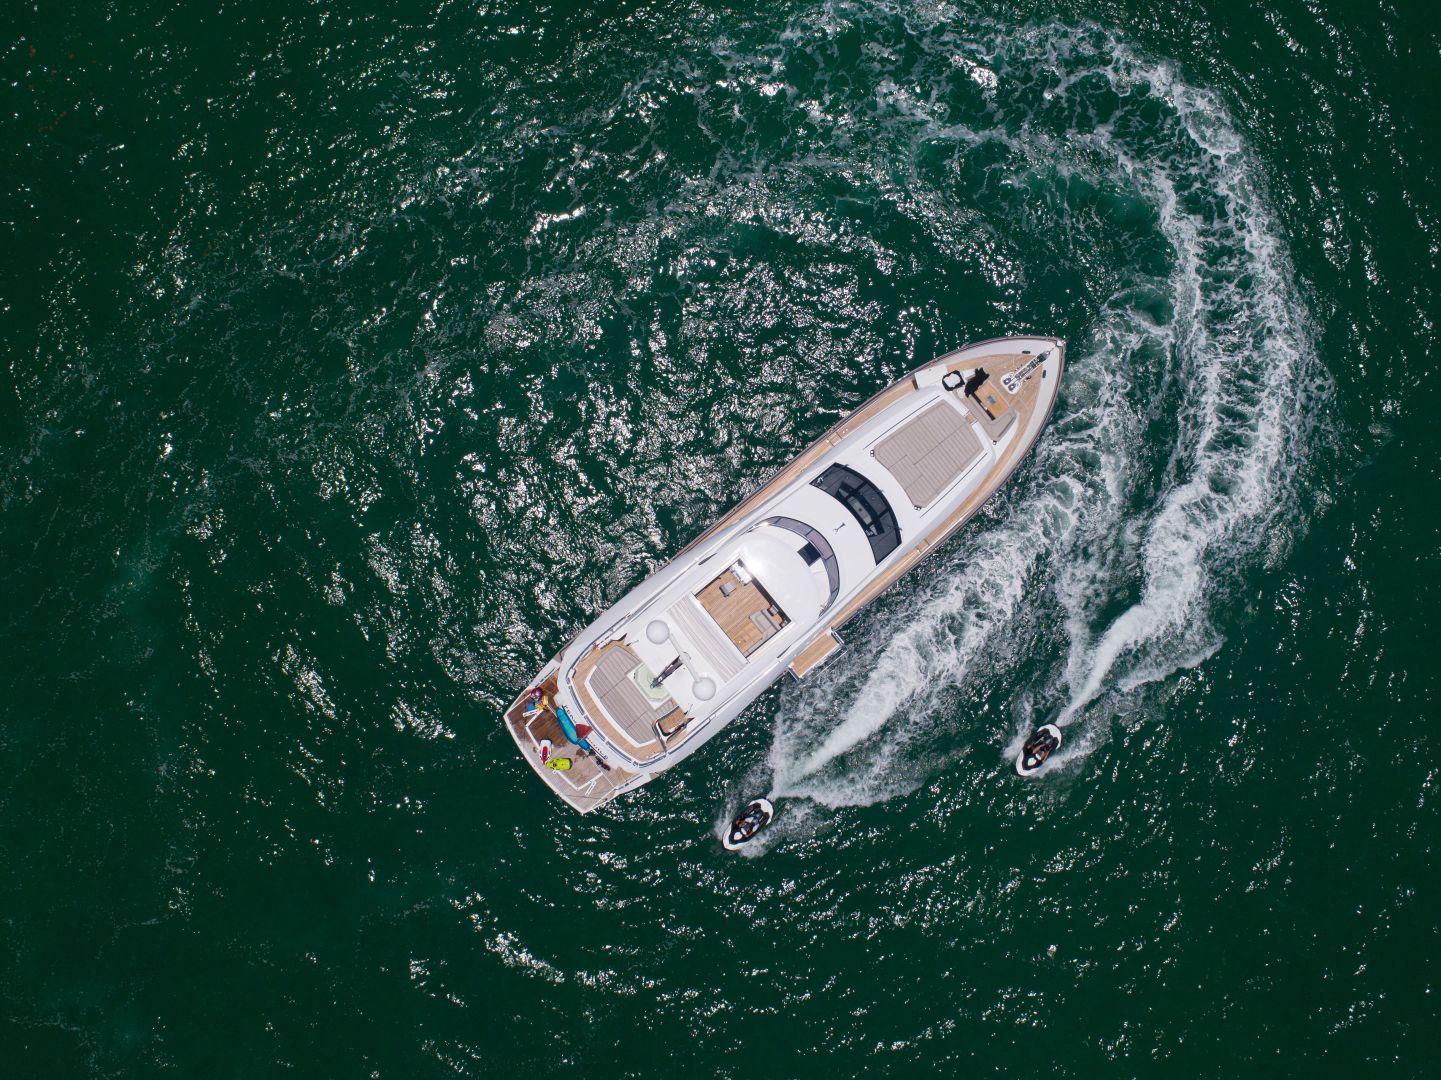 Sunseeker-95 Yacht 2017-Perseverance 3 Ft Lauderdale-Florida-United States-1400069   Thumbnail